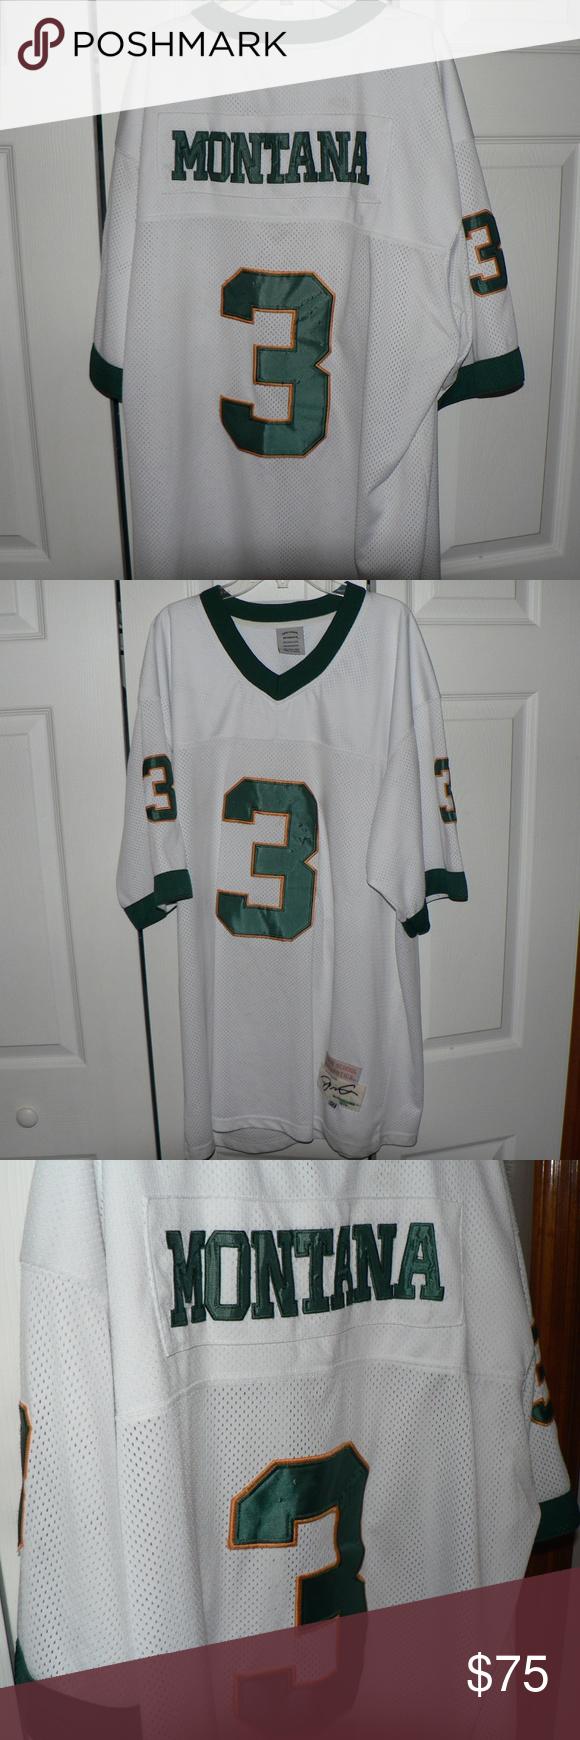 d2860b45655 Vintage Joe Montana Notre Dame Football Jersey True School Athletics Vintage  Notre Dame Fighting Irish Football